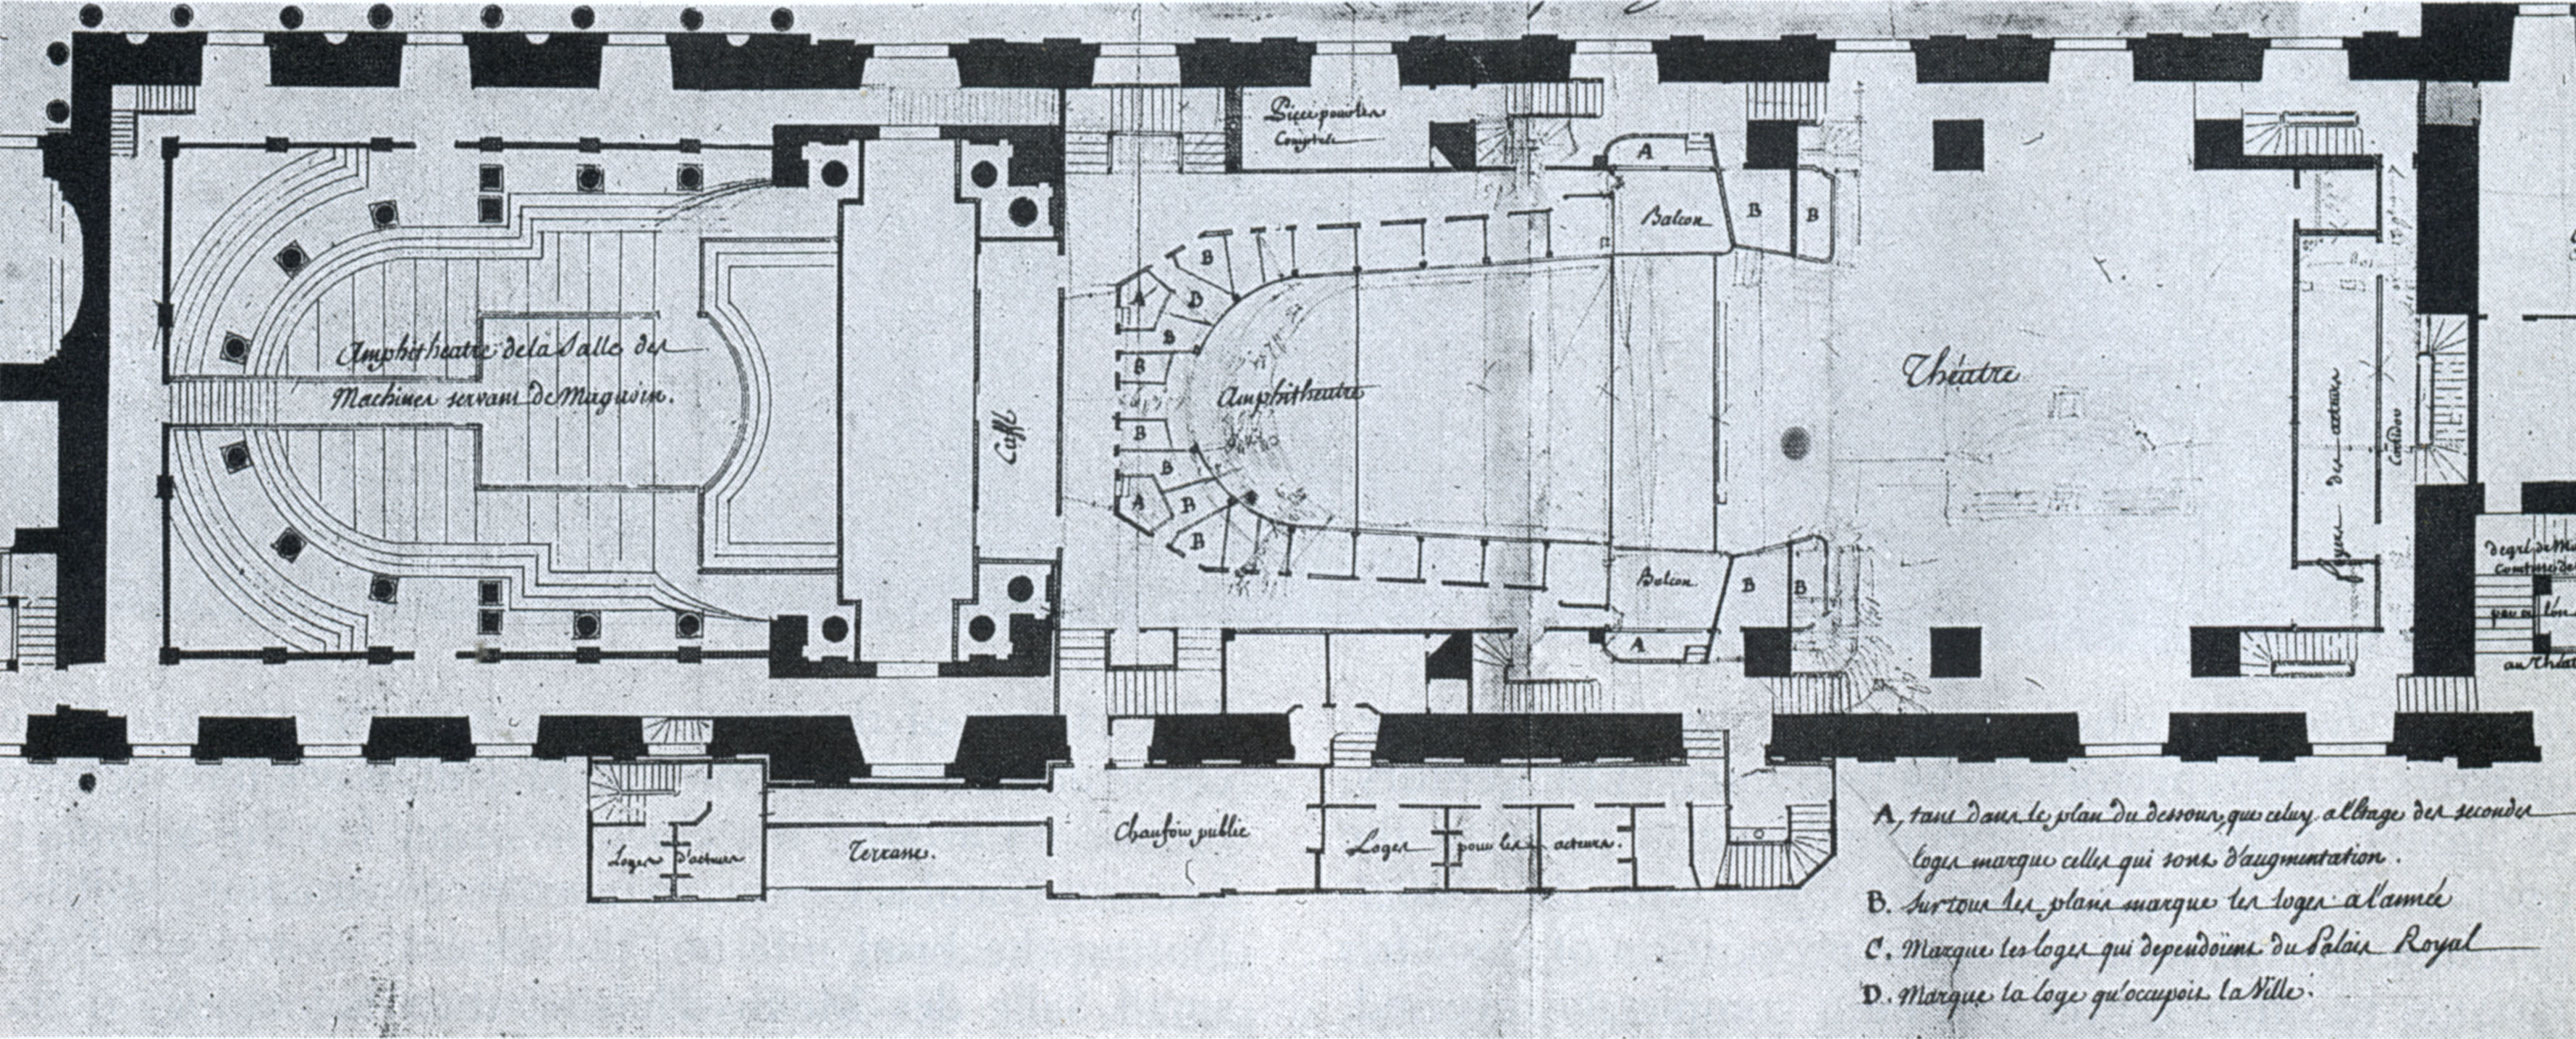 File:Salle des Machines - 1763 plan by Soufflot and Gabriel ...